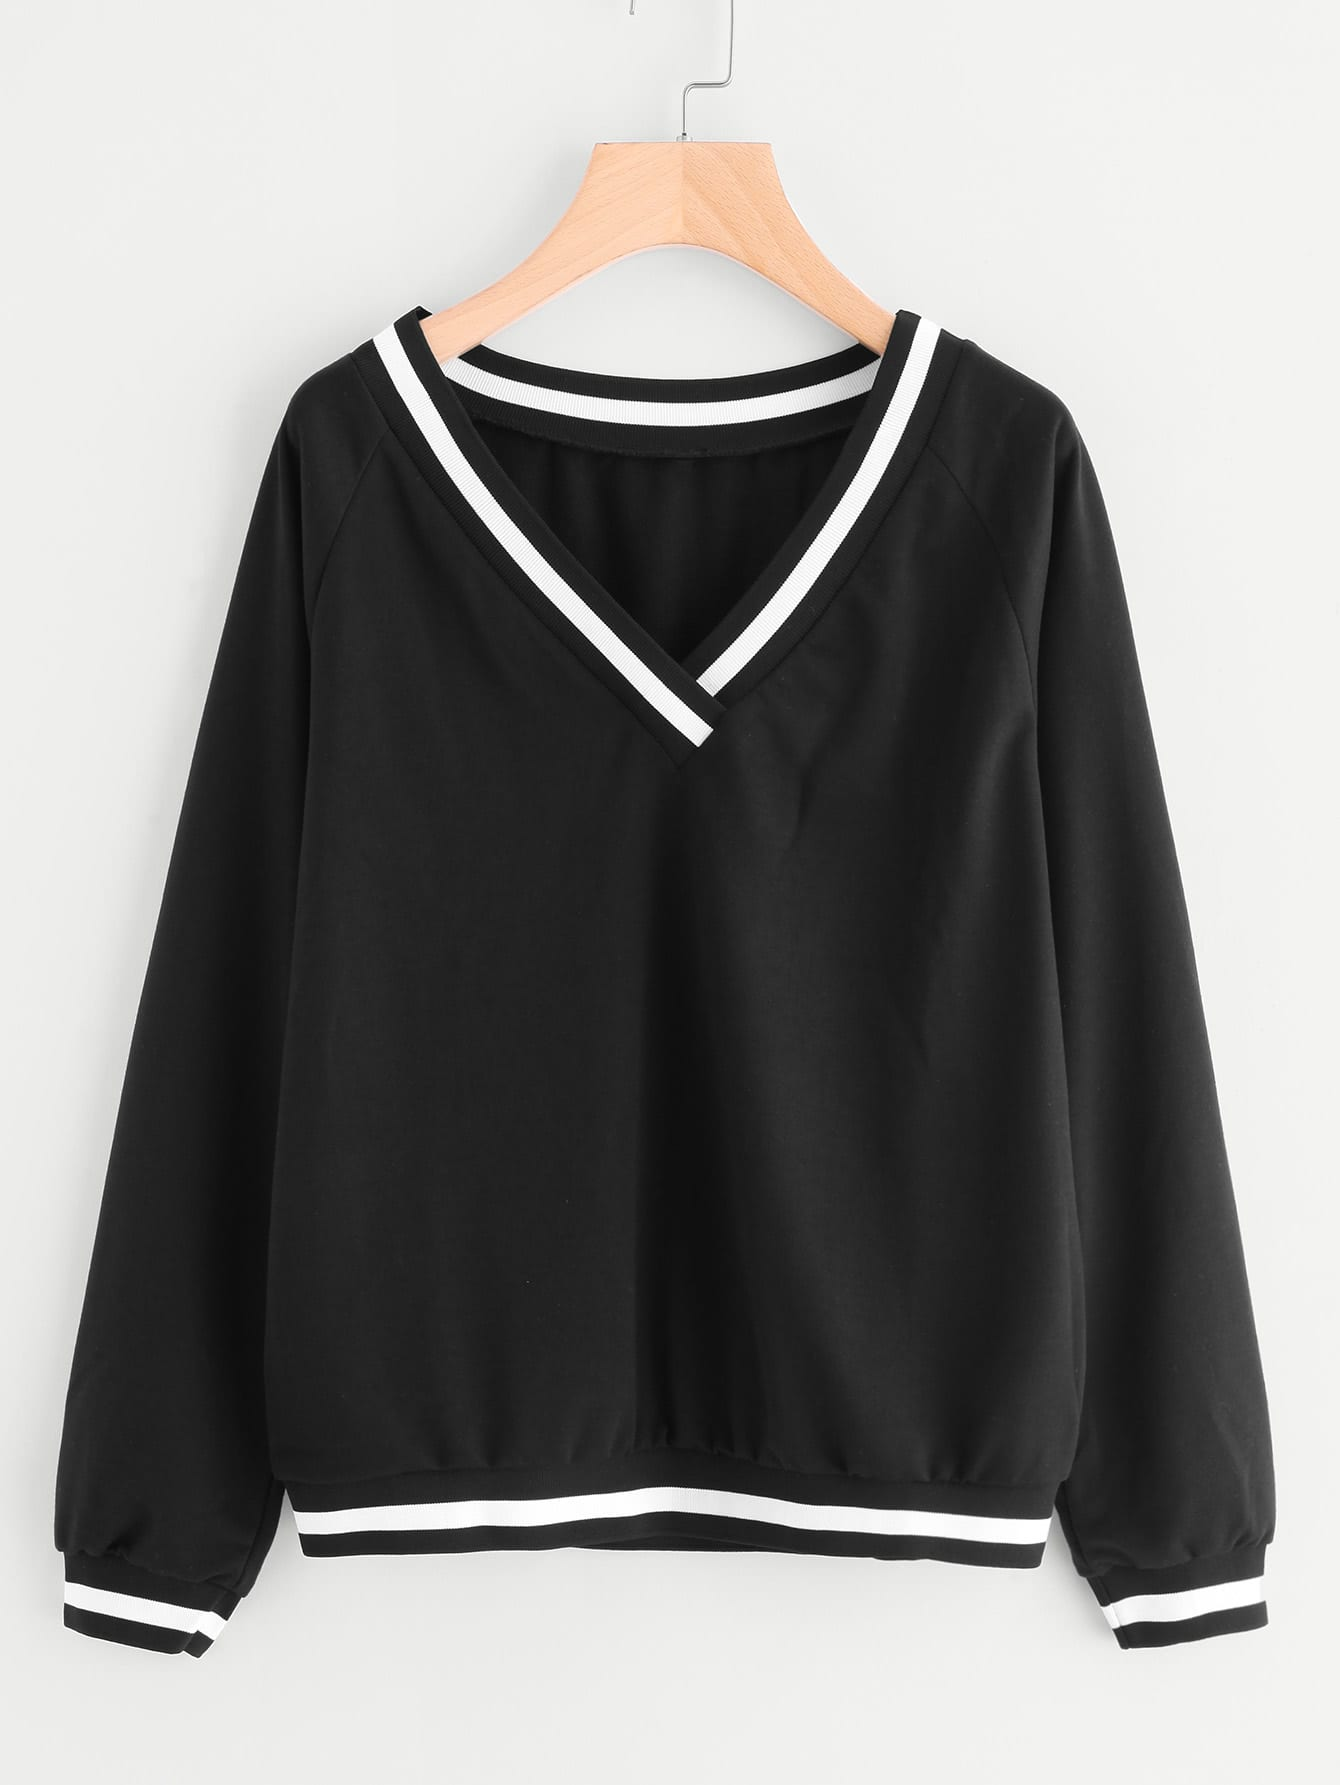 Striped Ribbed Trim Sweatshirt sweatshirt170925450